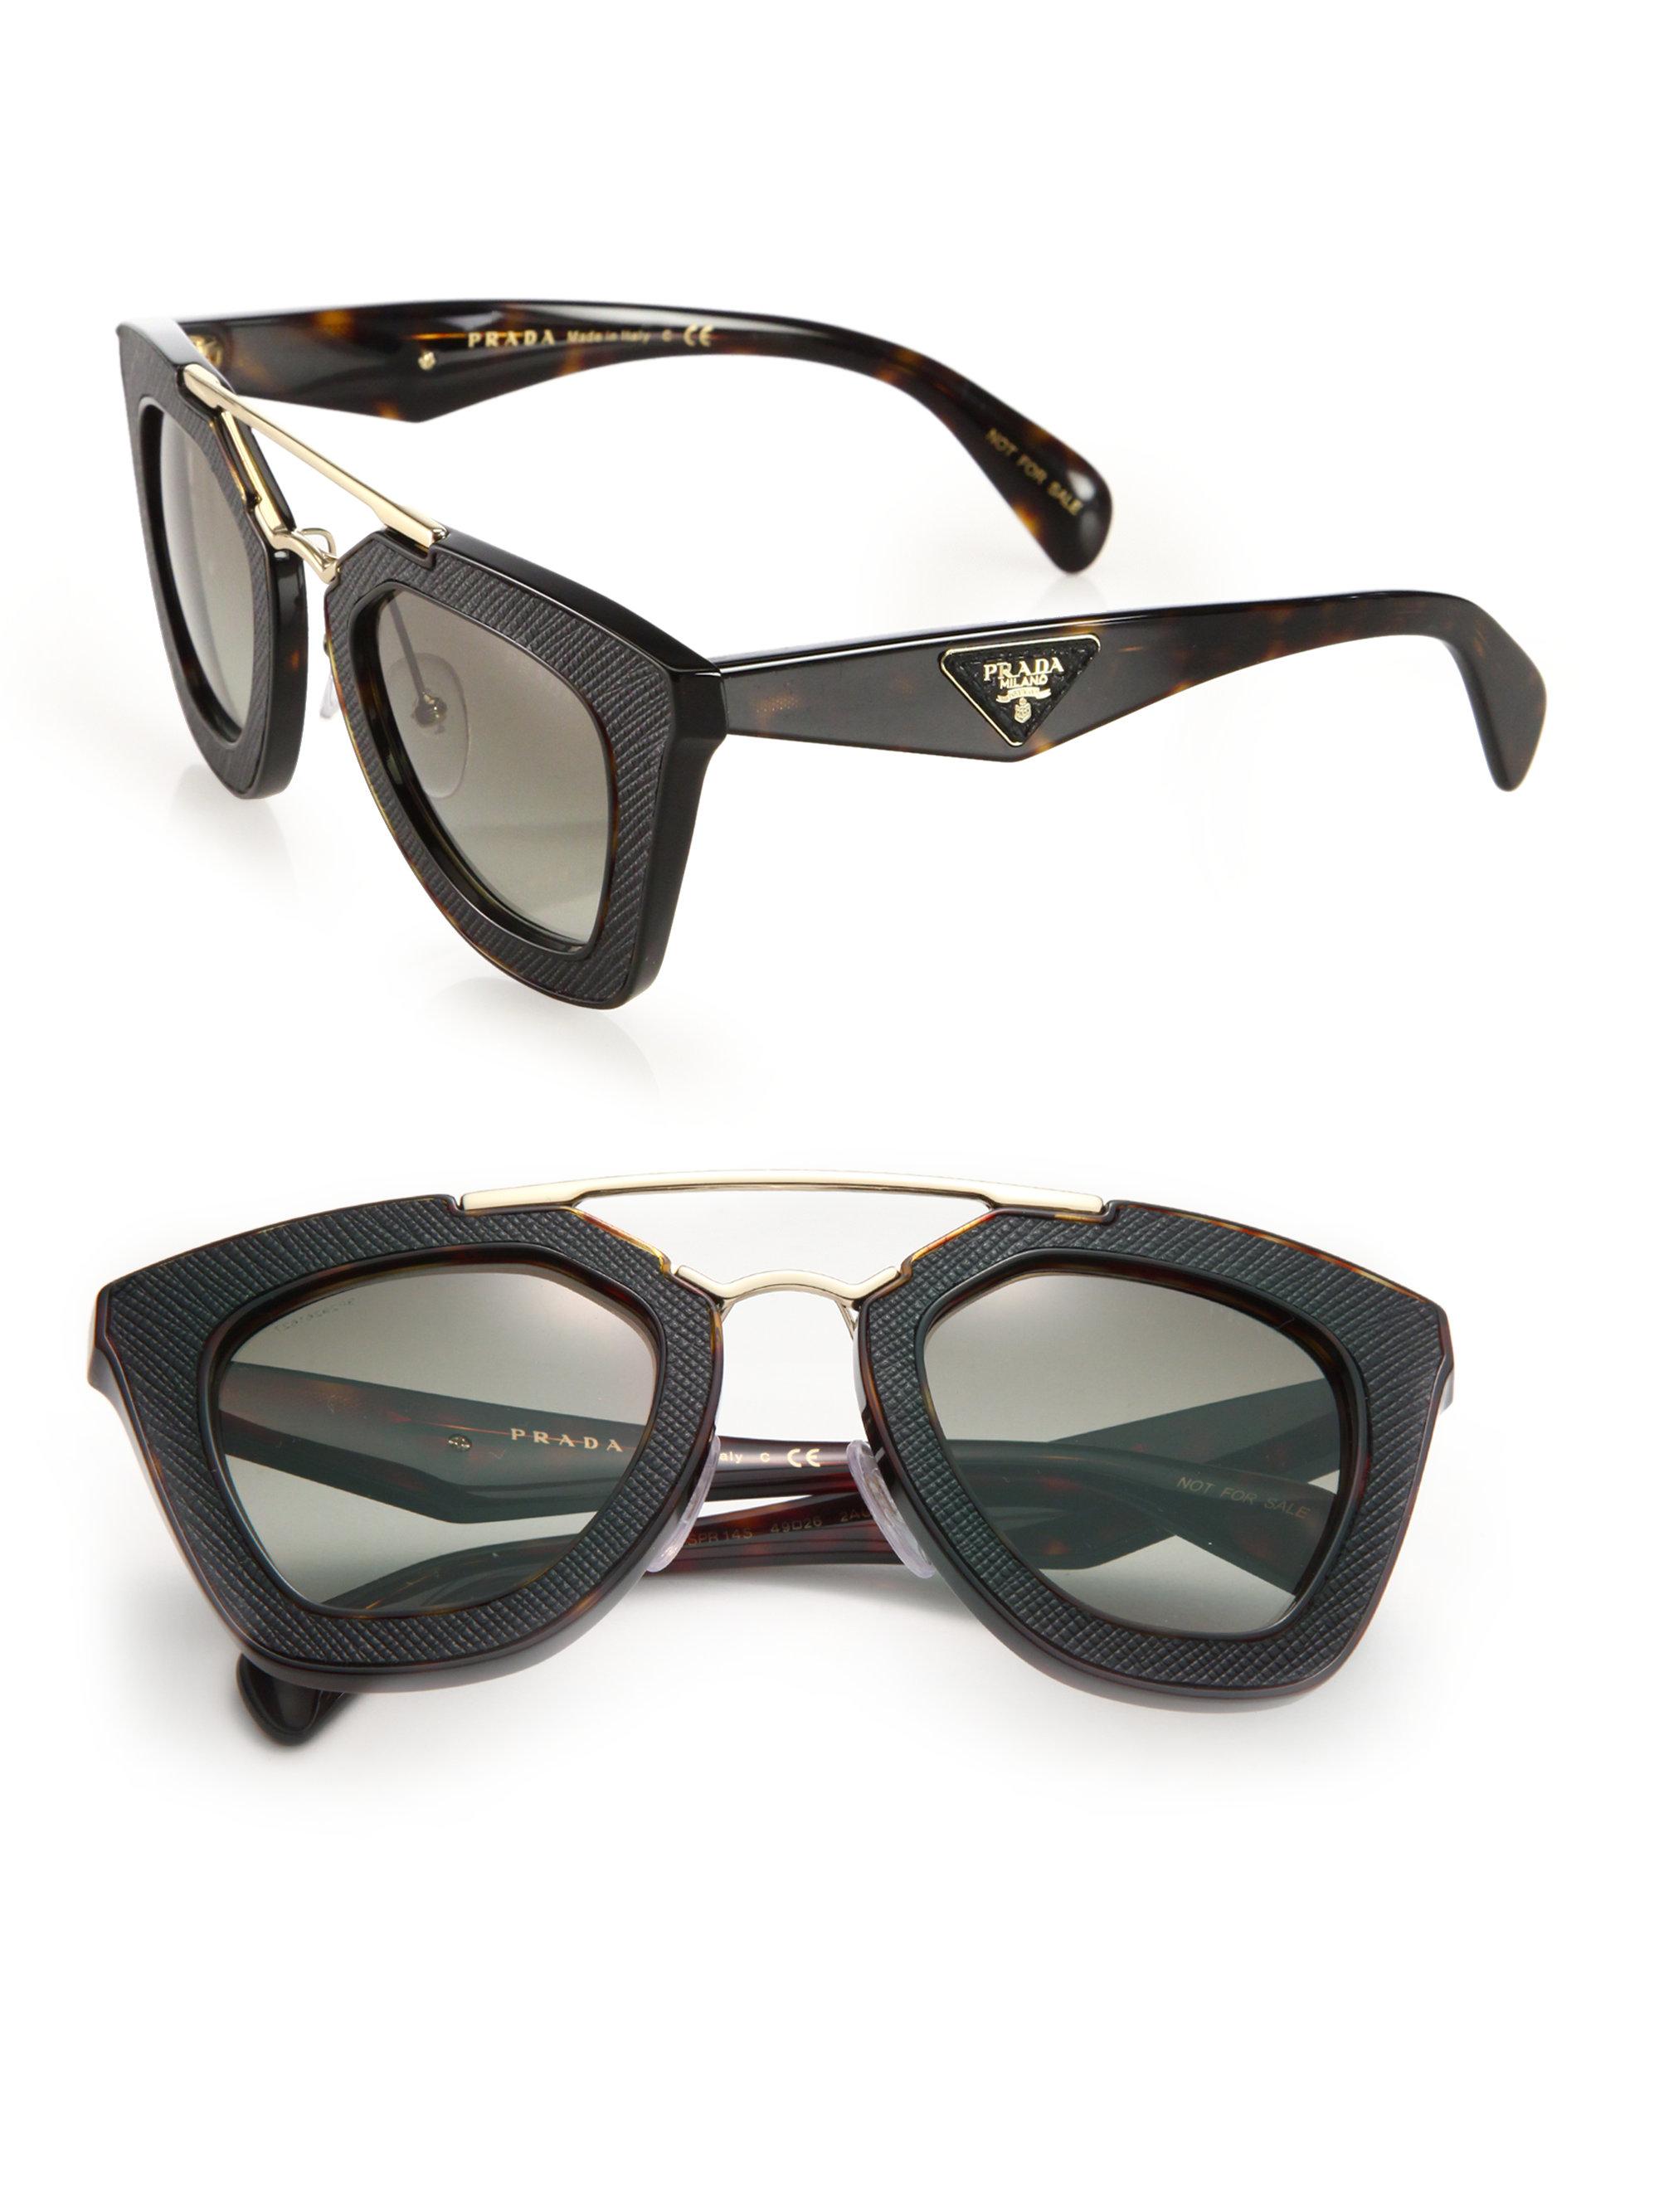 32f8b3714d07 ... promo code for lyst prada ornate 14ss 49mm saffiano leather sunglasses  in black 1aba4 36914